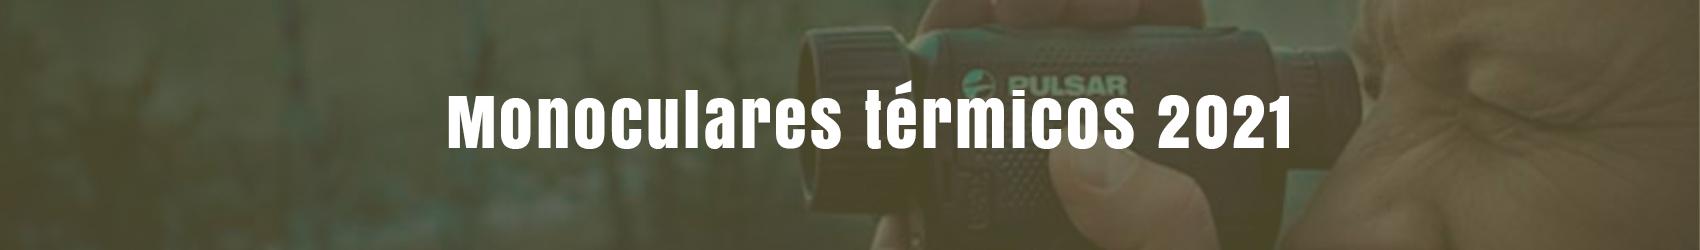 vision termica caza